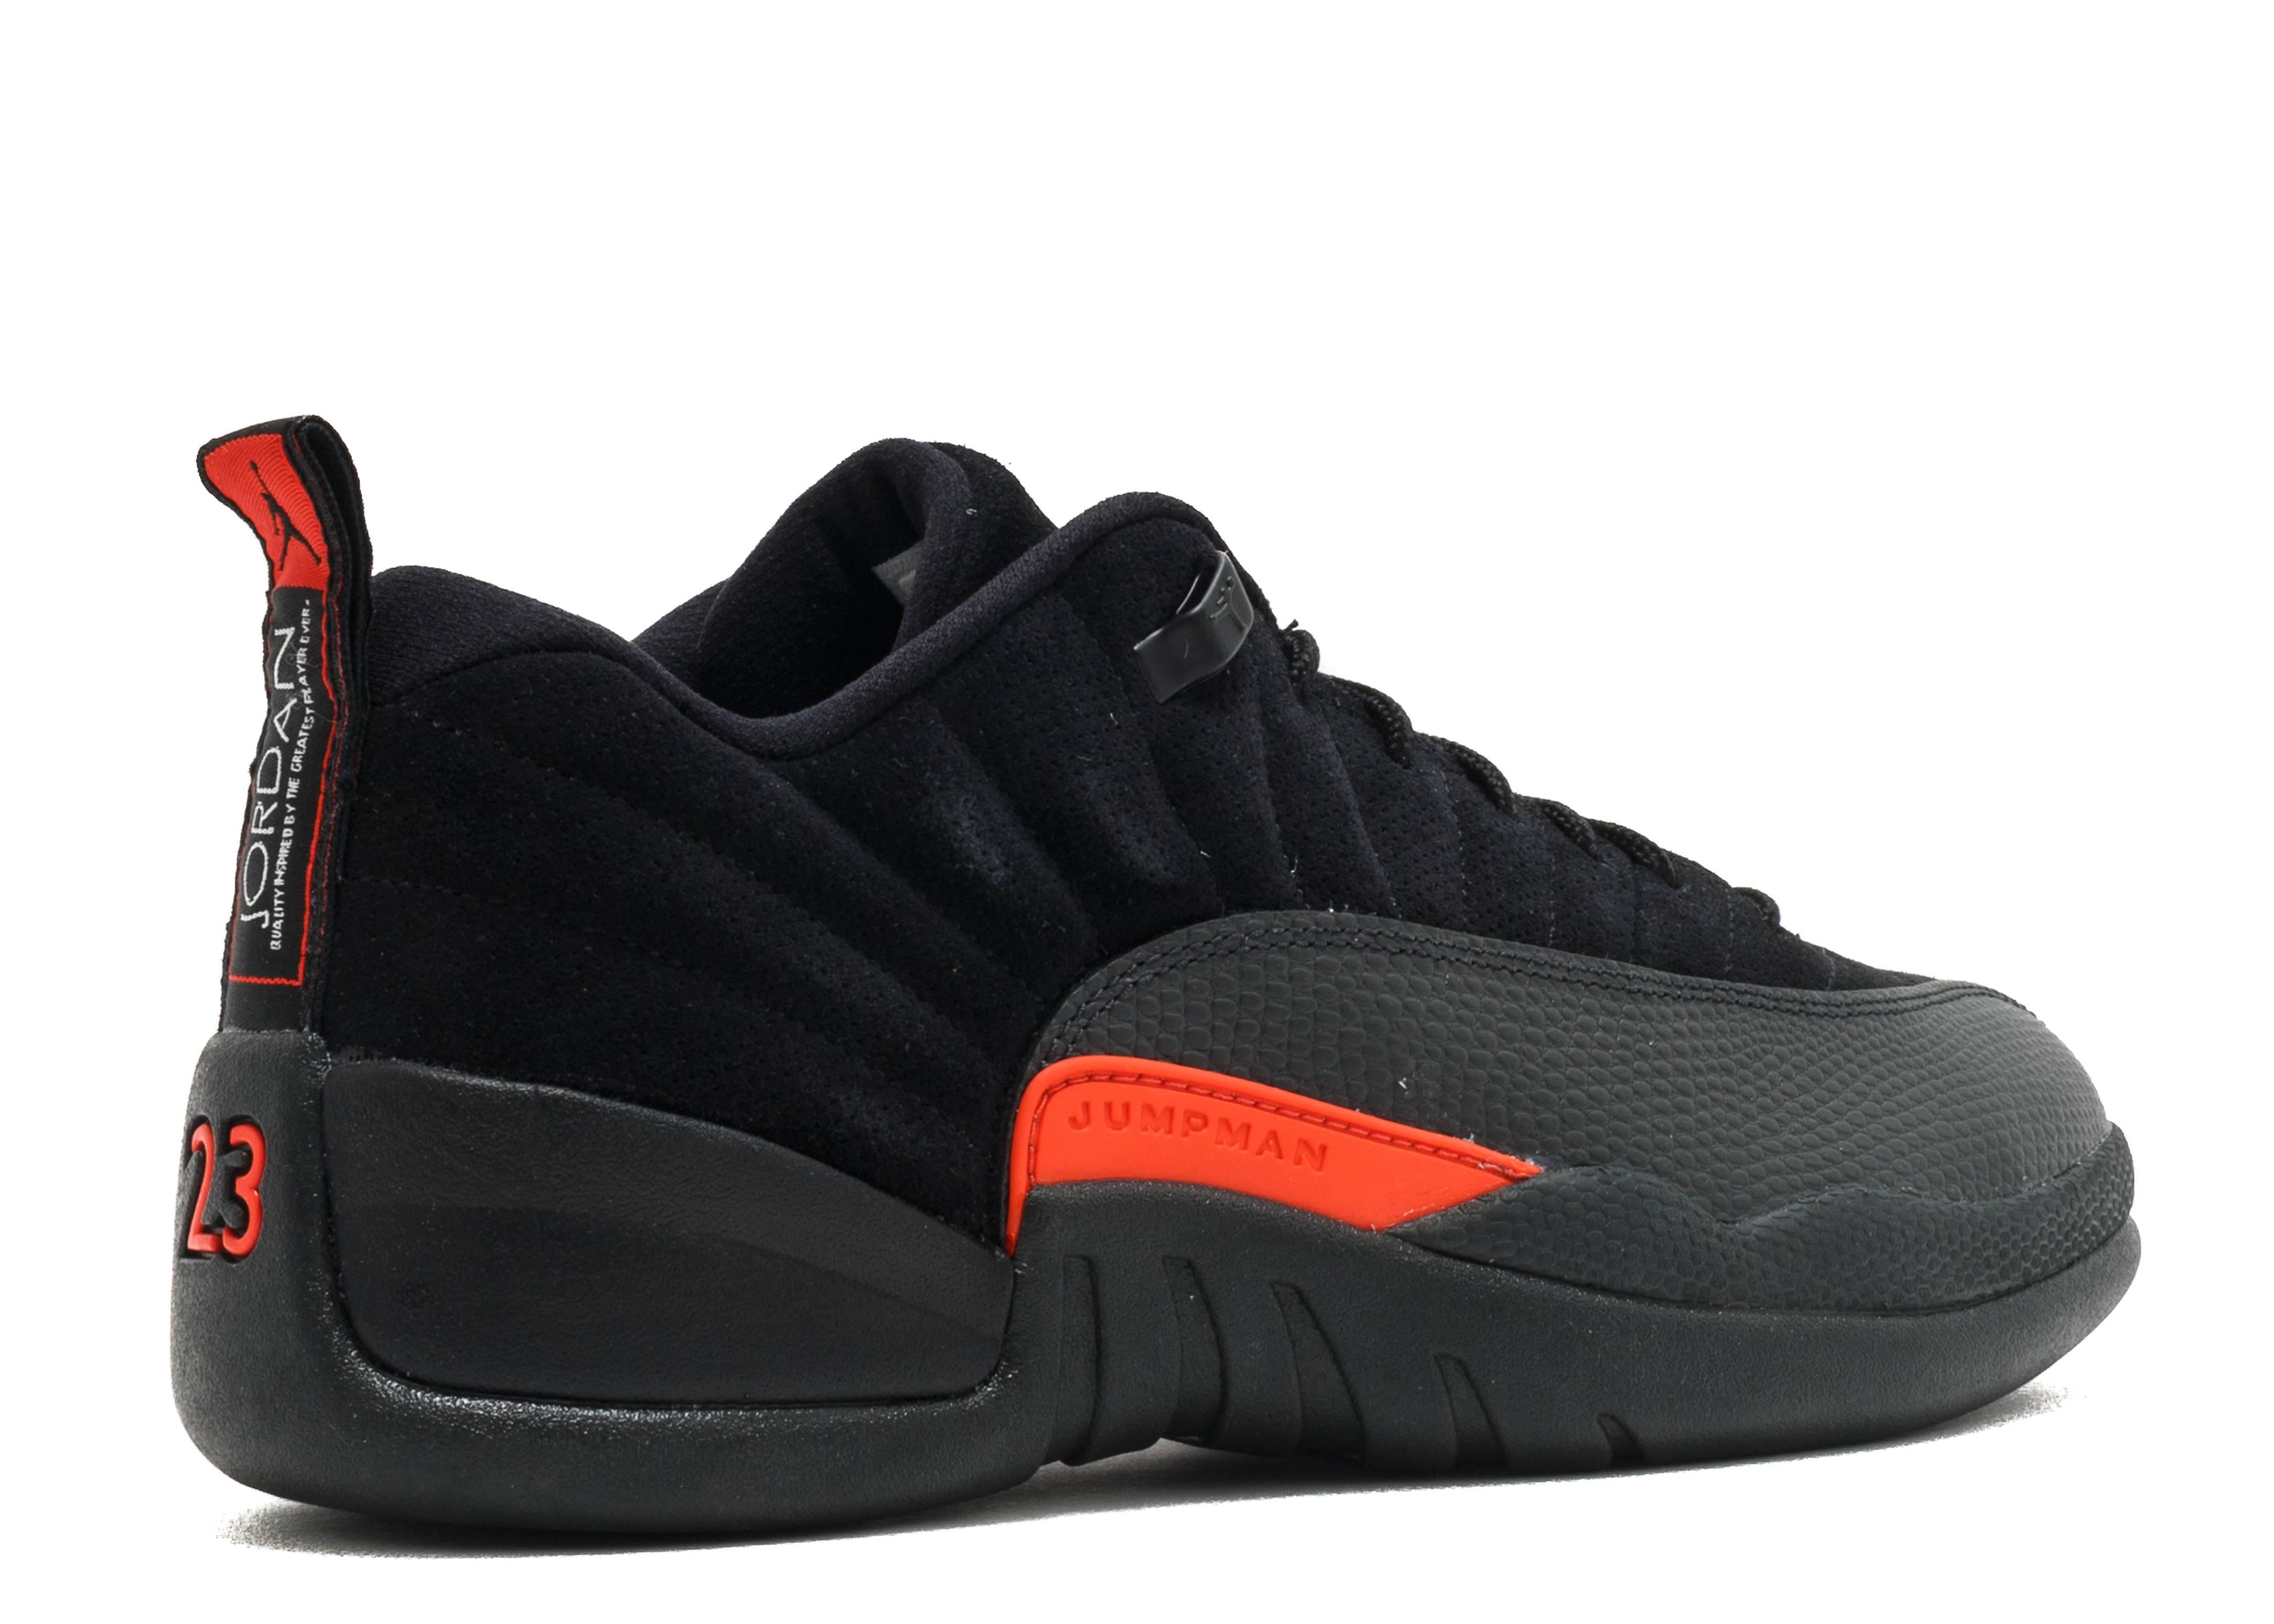 Jordan 12 Low Retro 'Max Orange' - Size 13 - Us Size POgUh